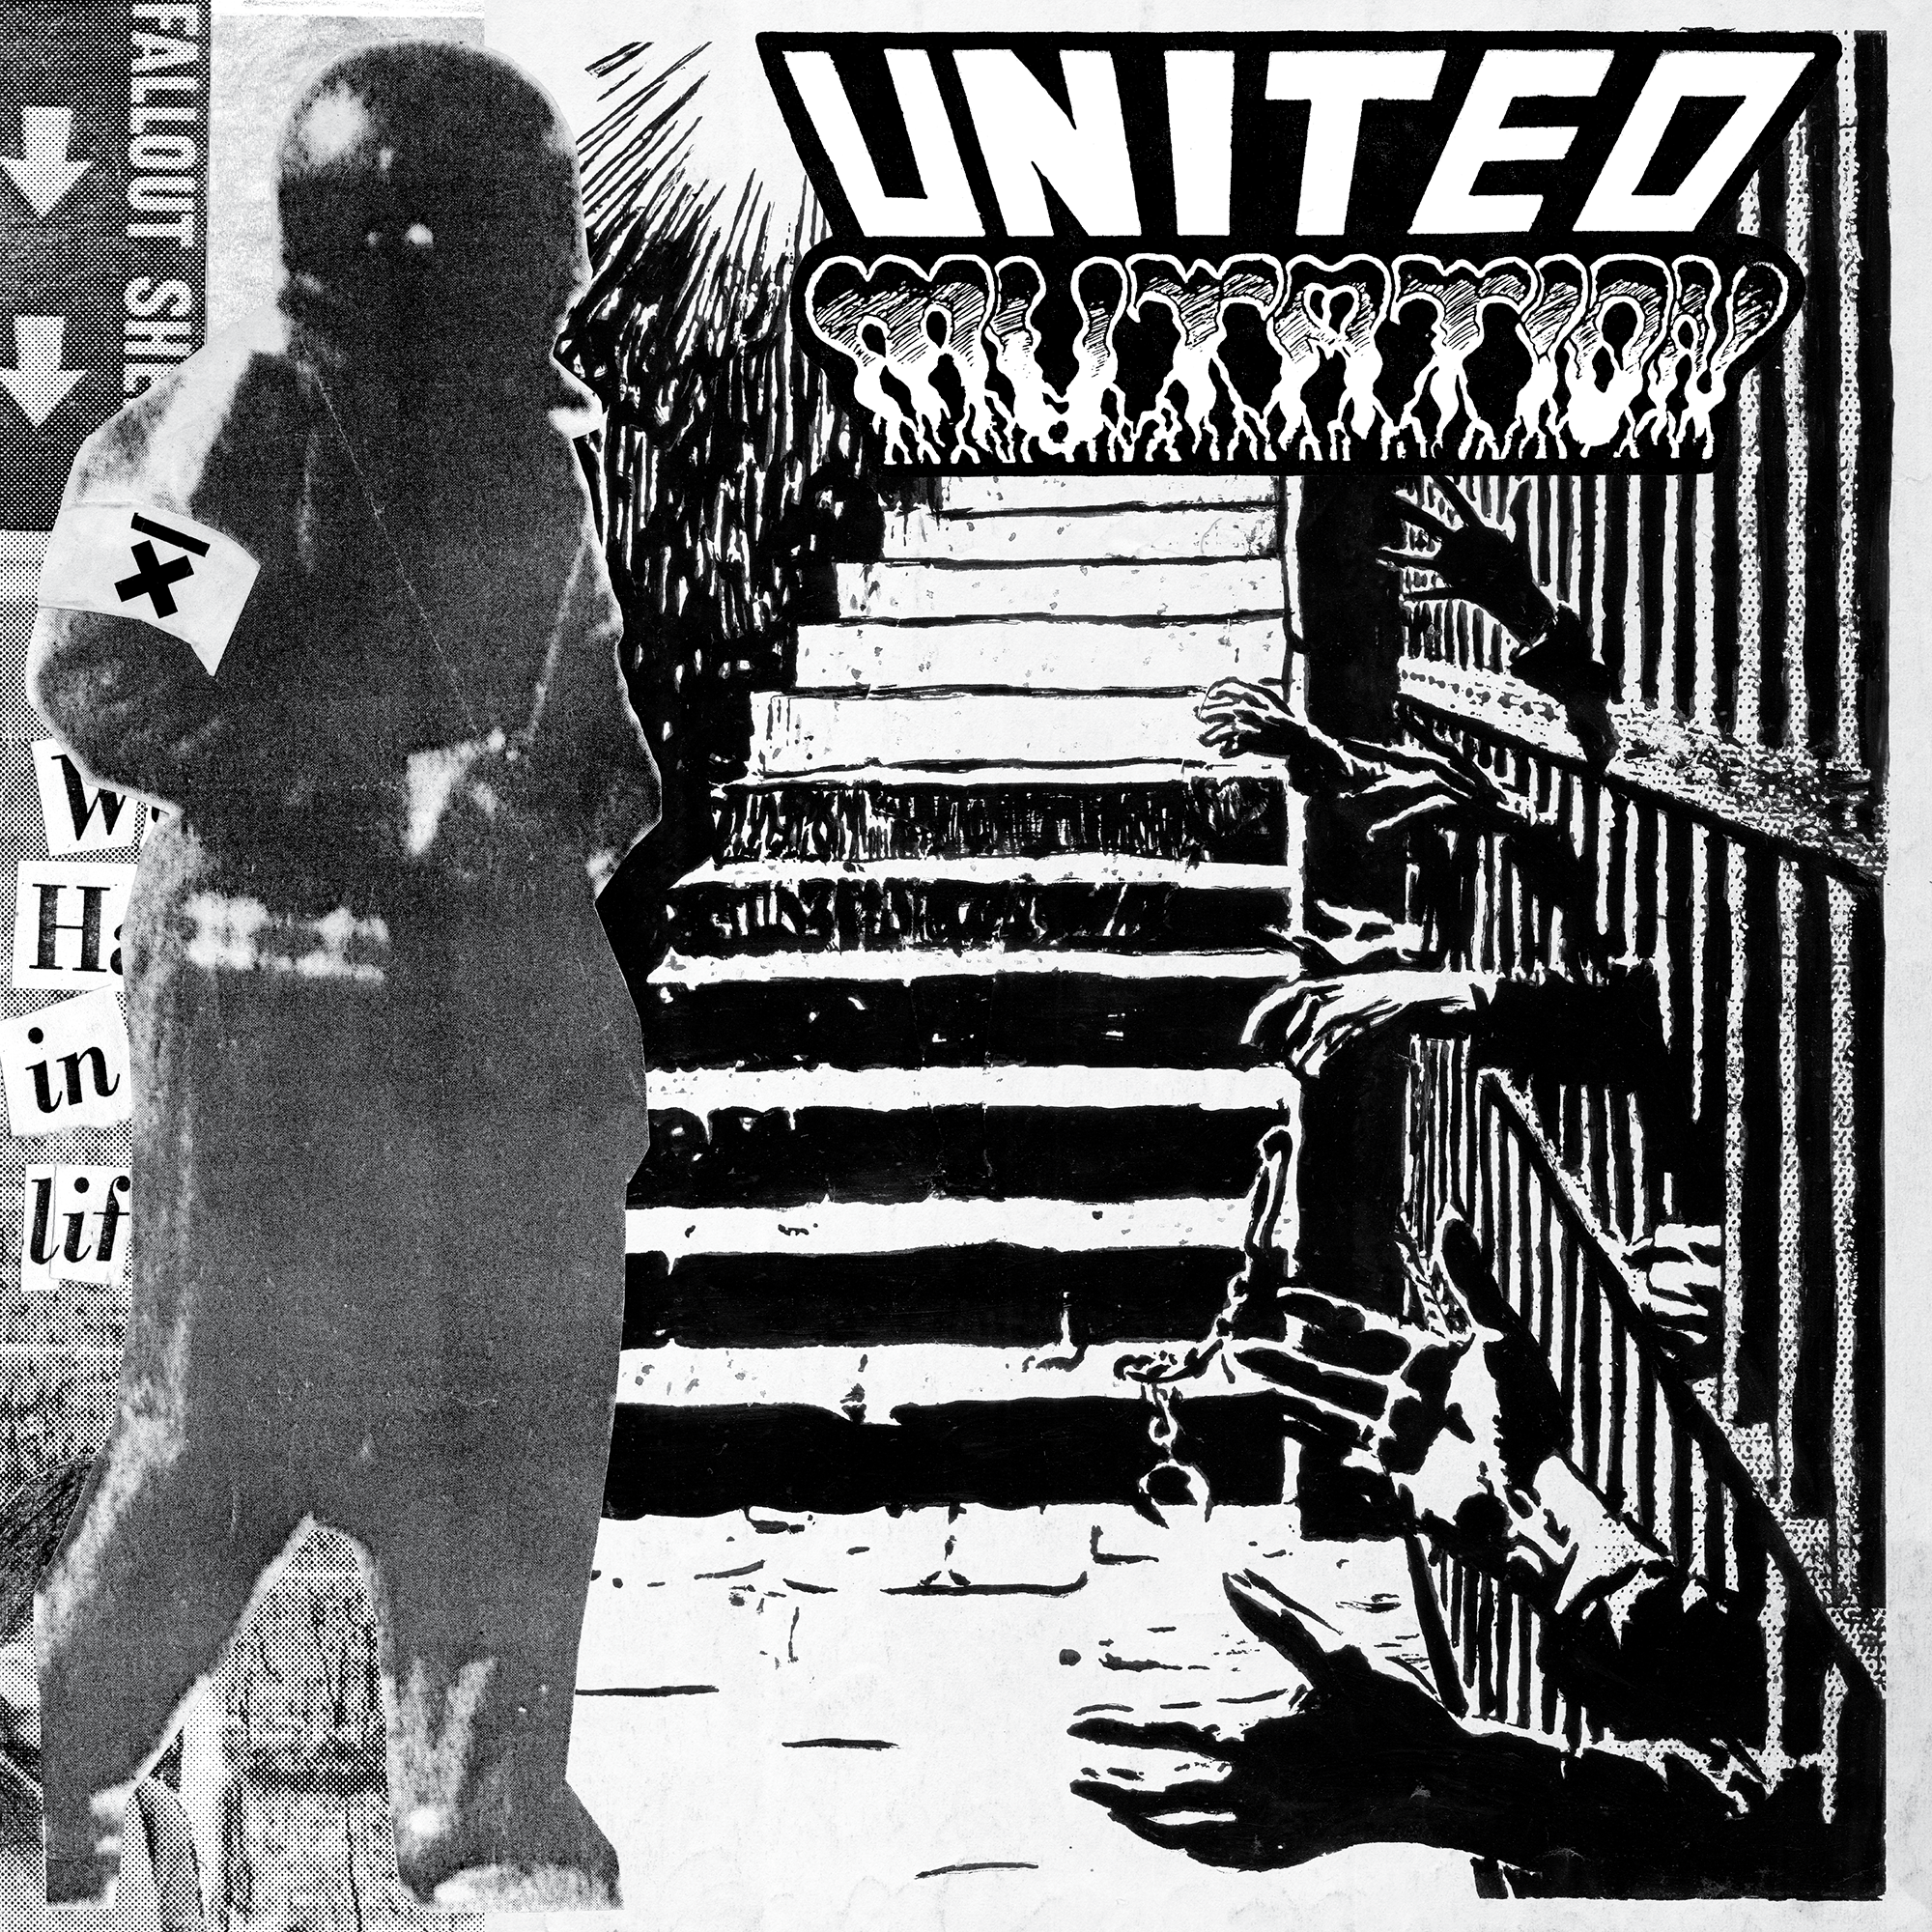 United Mutation - Dark Self Image - 1982/1983